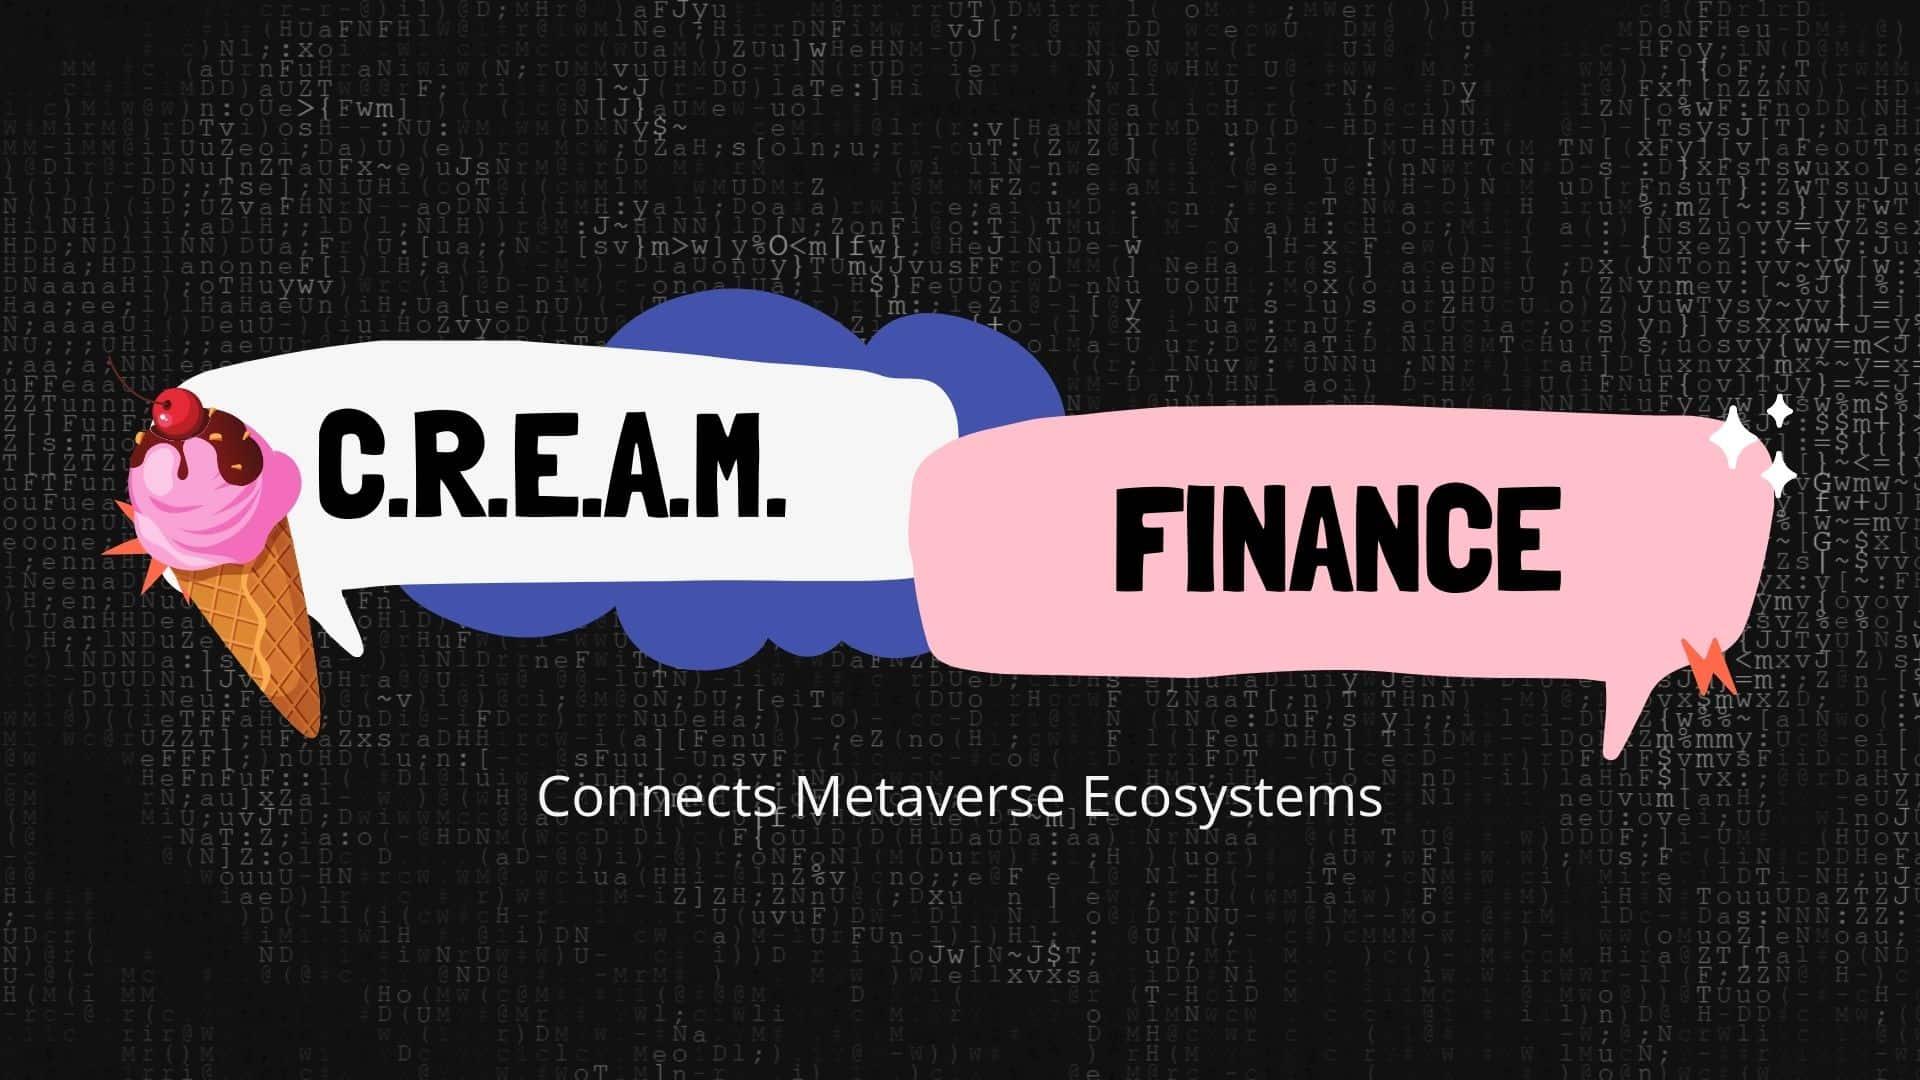 CREAM FINANCE GAMING TOKENS